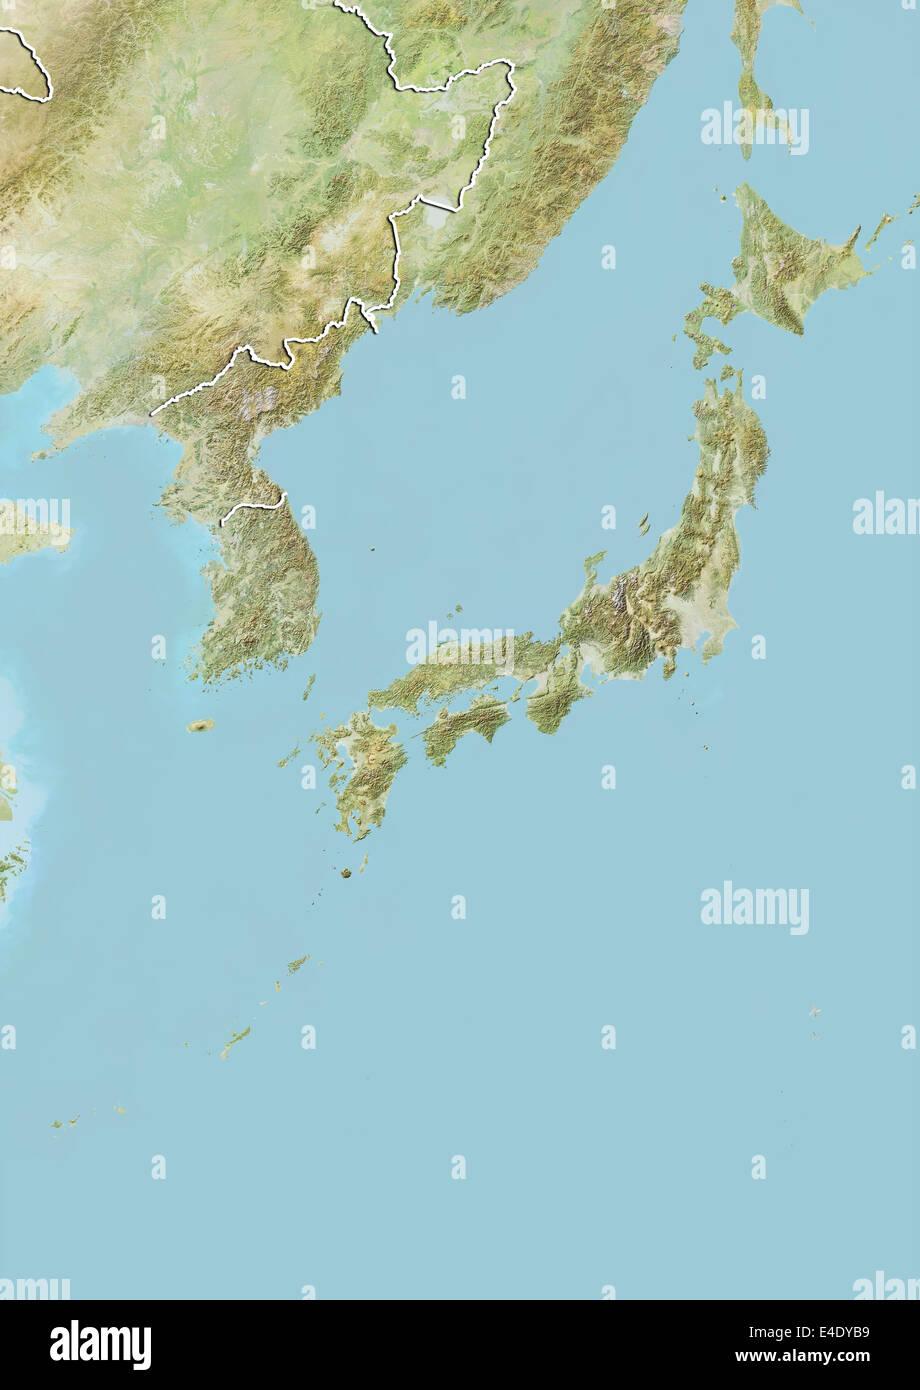 Map Satellite Geography Japan Stock Photos & Map Satellite Geography ...